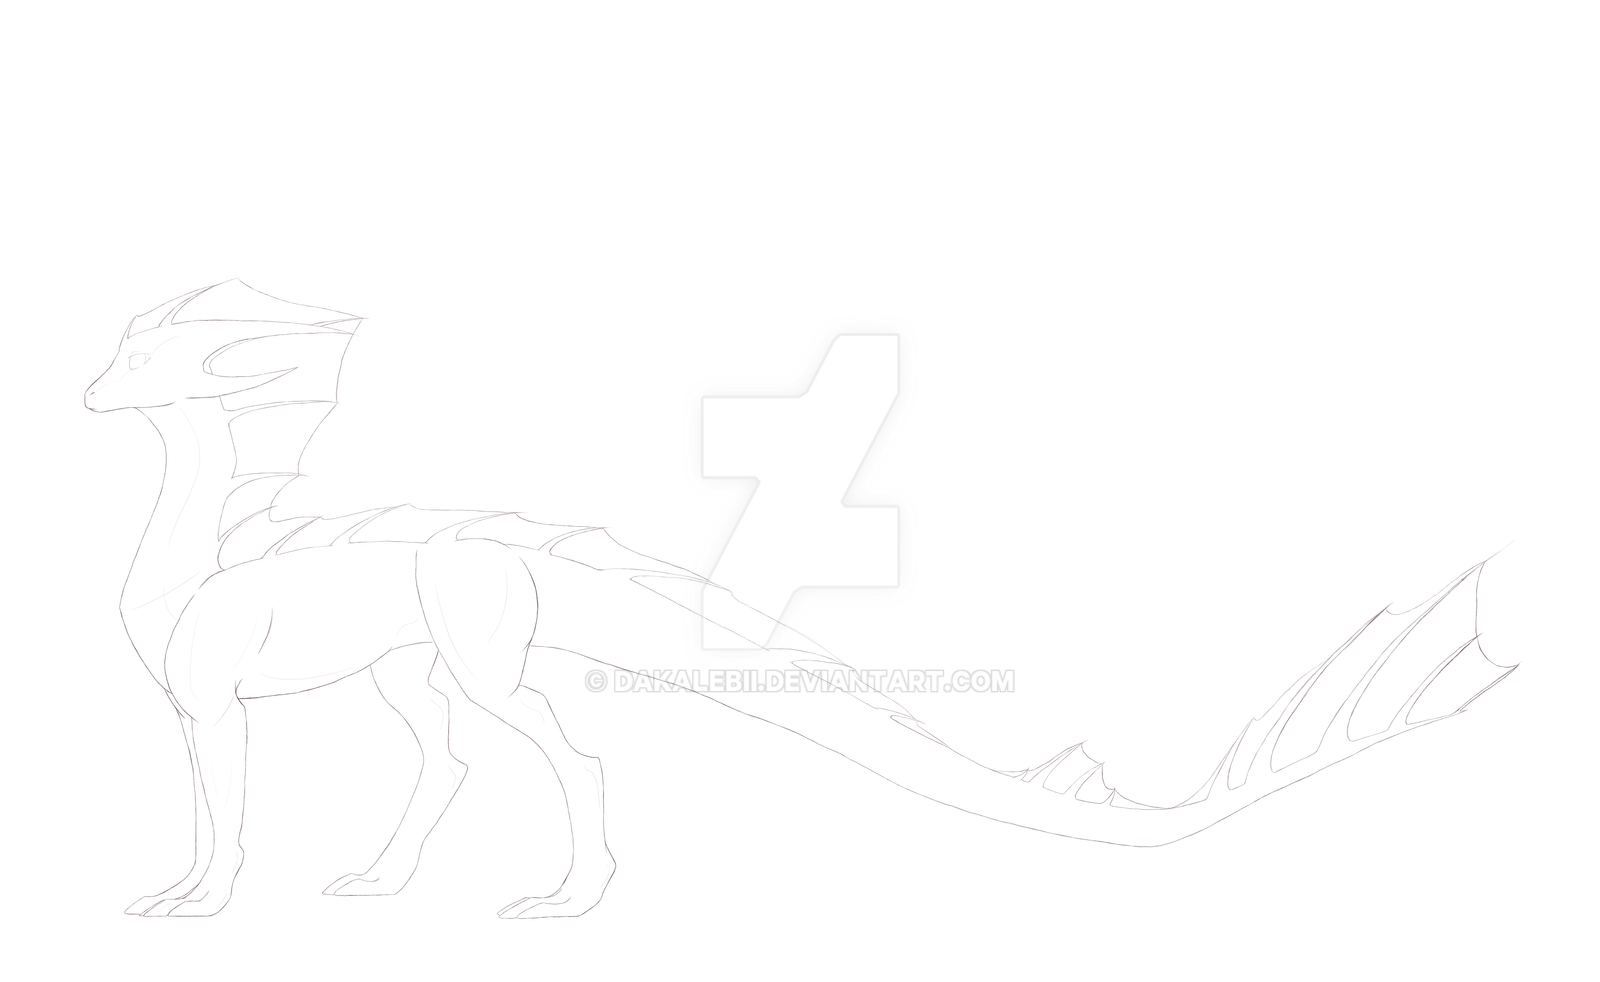 Dragon Lineart by Dakalebii